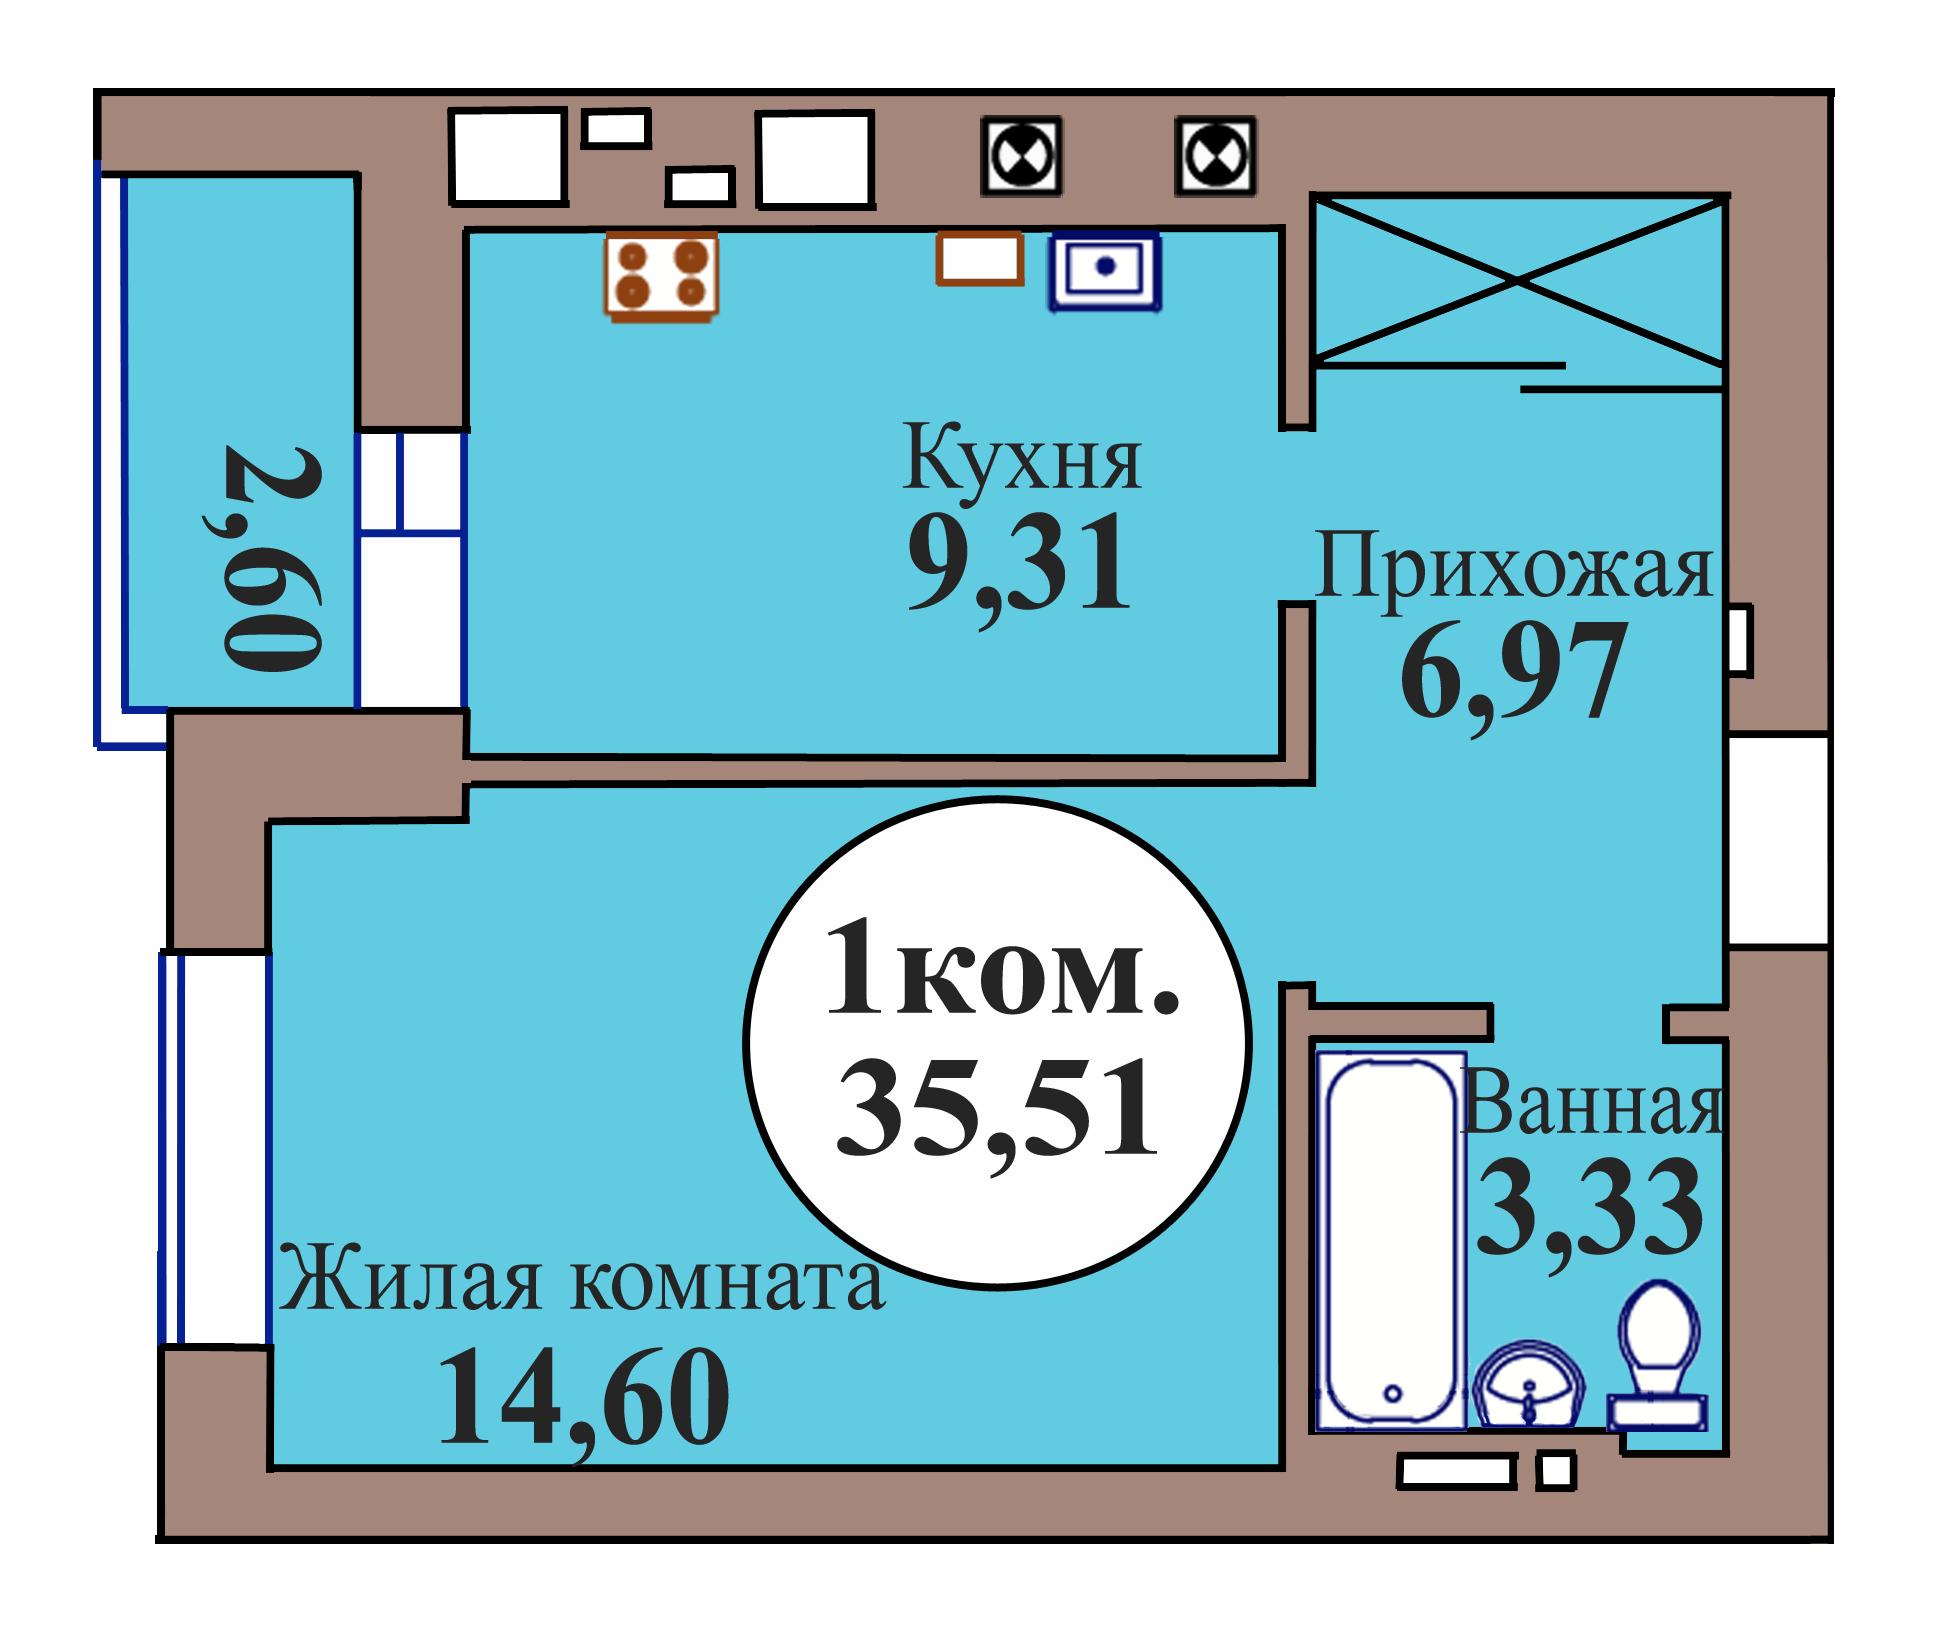 1-комн. кв. по ГП дом №3, МКР Васильково, кв. 6 в Калининграде